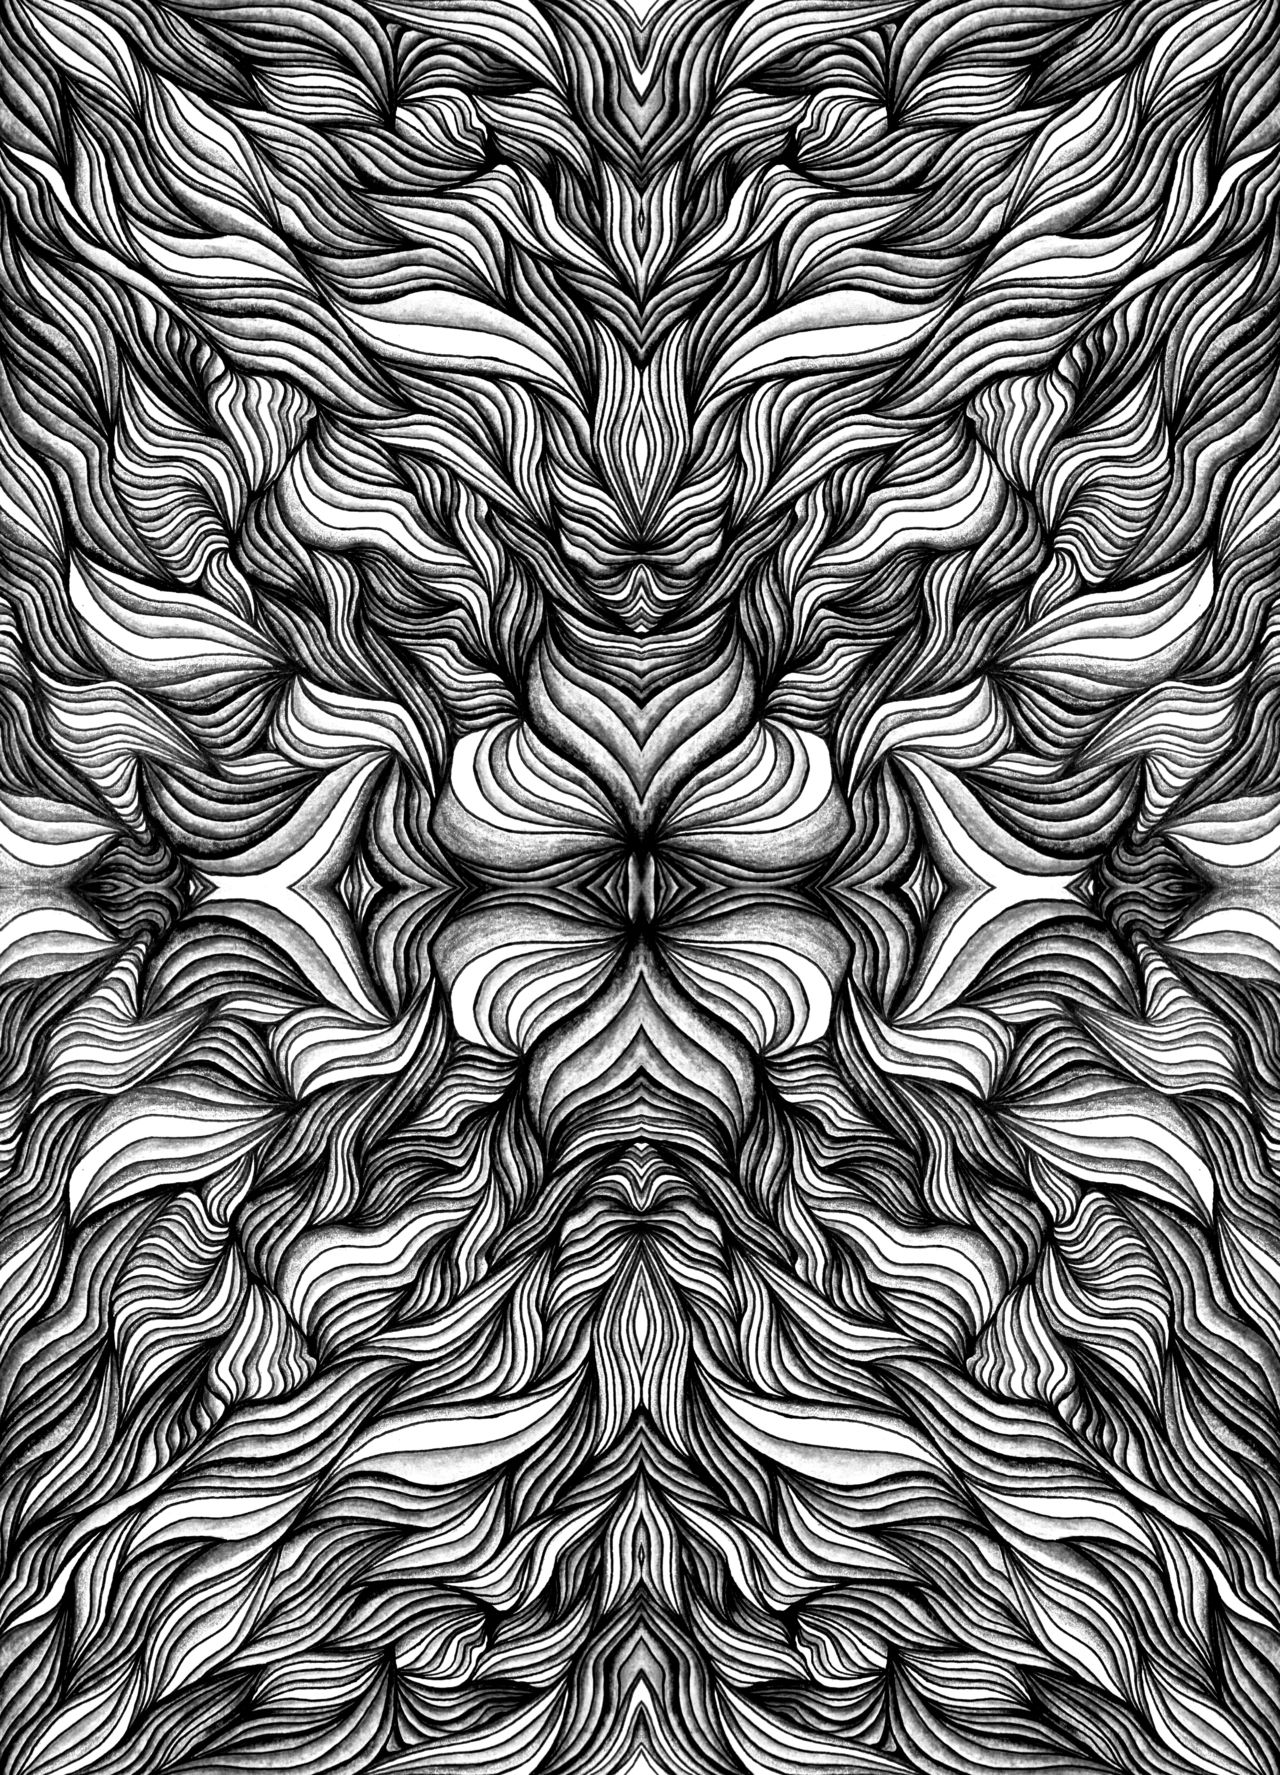 Black White Psychedelic Art Psychedelic Art Smoke Art